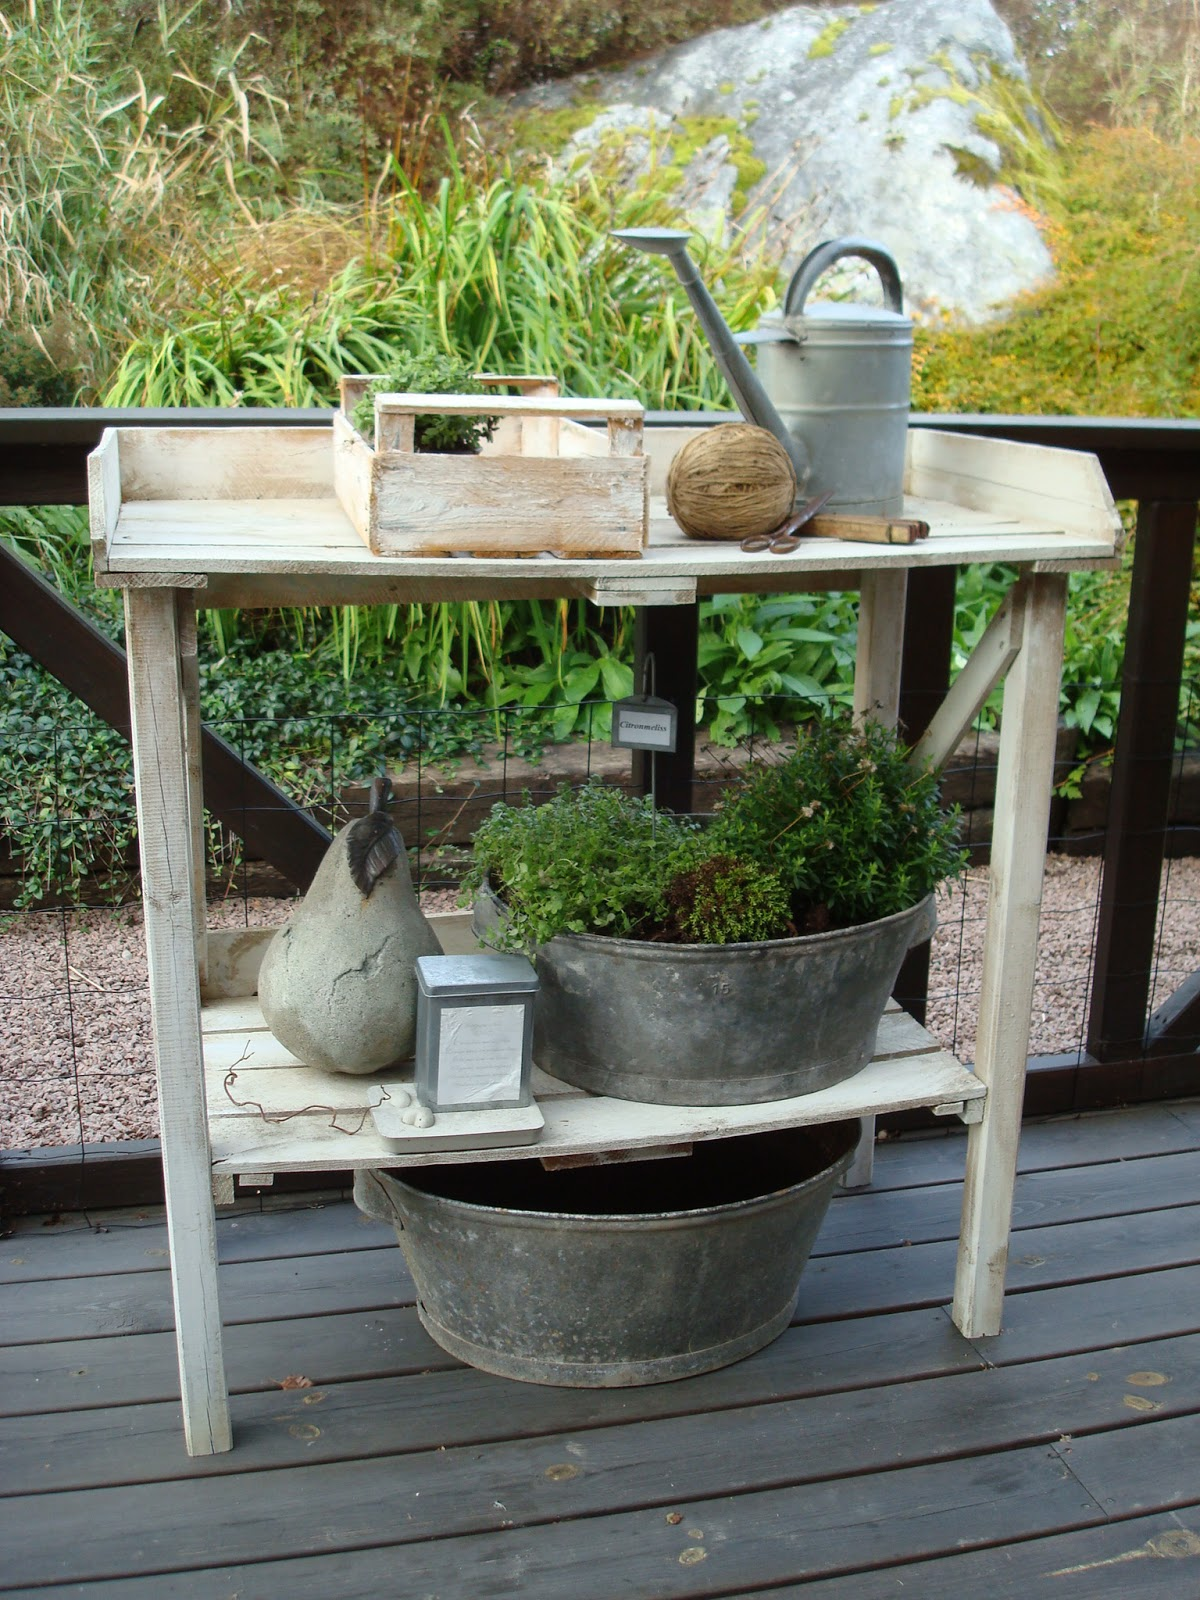 Vit hortensia: oktober 2012